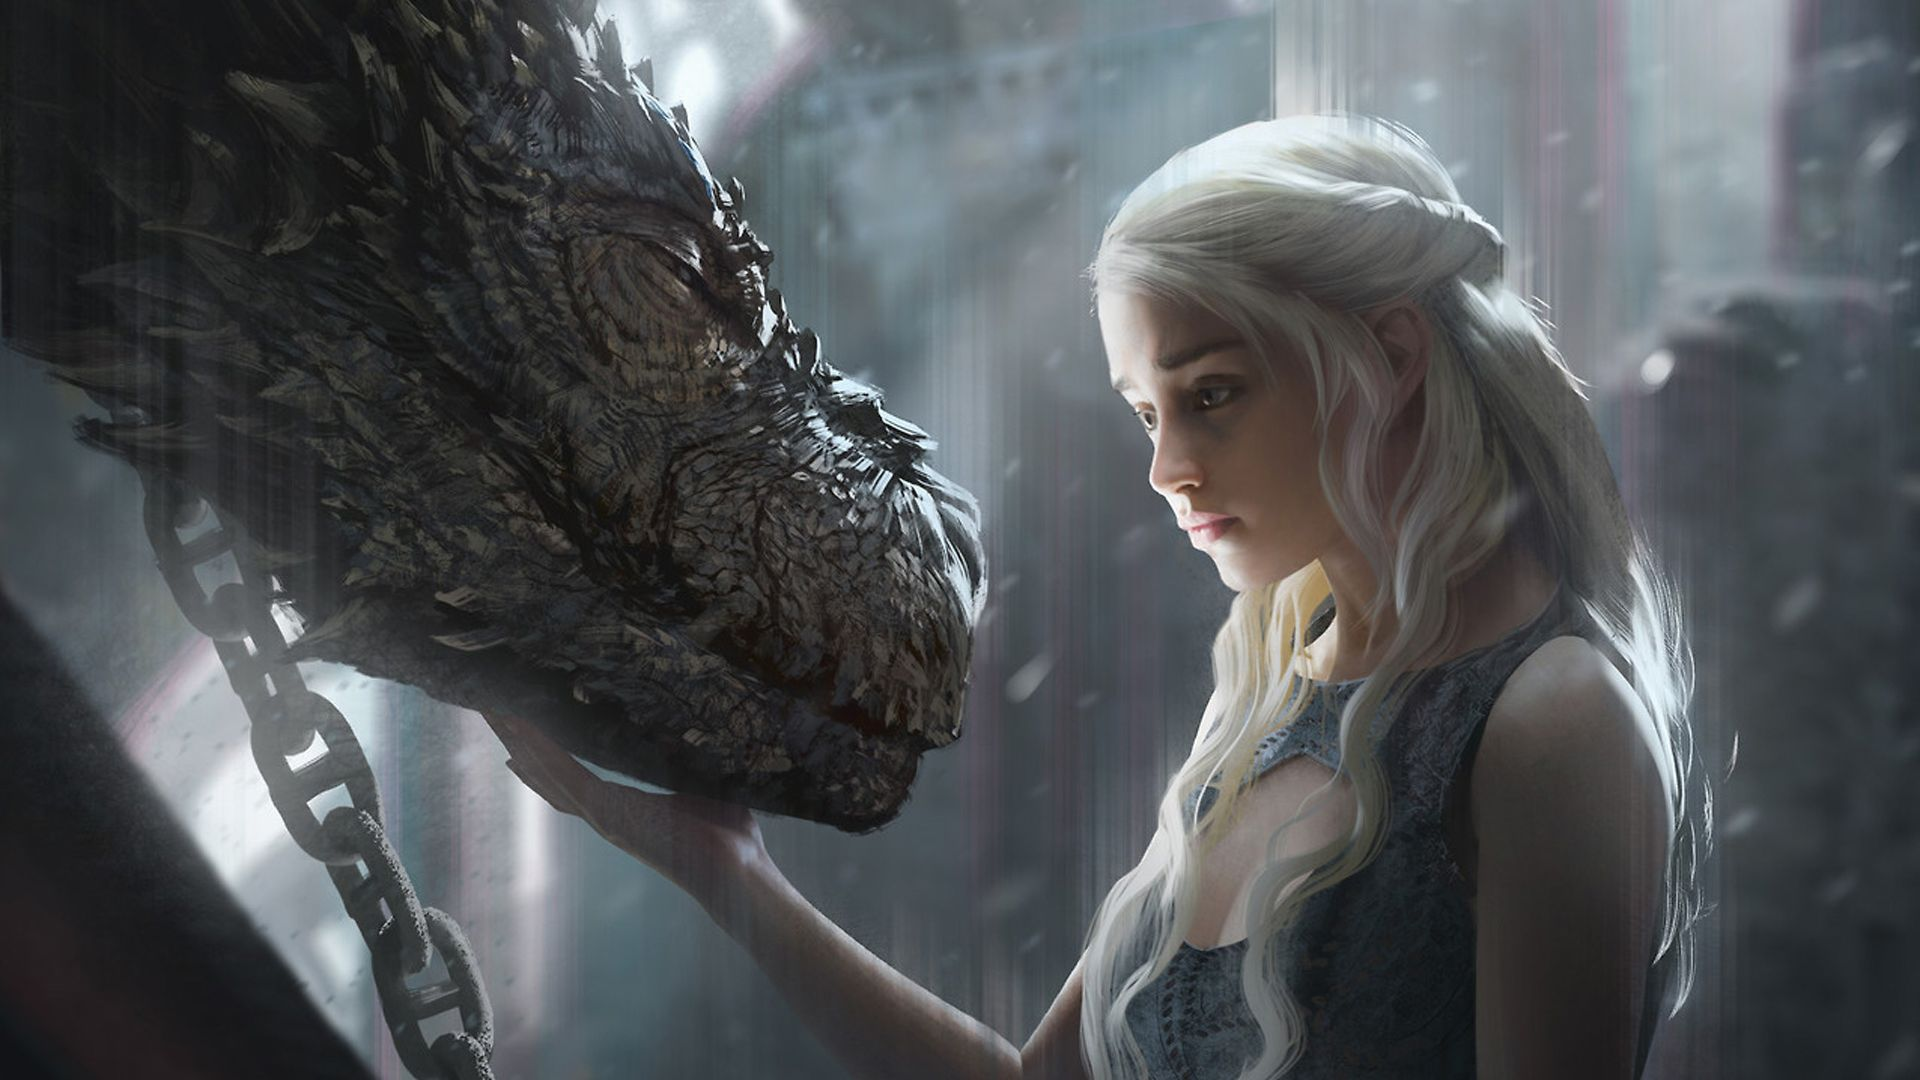 Wallpaper Daenerys Targaryen, dragon, game of thrones, artwork